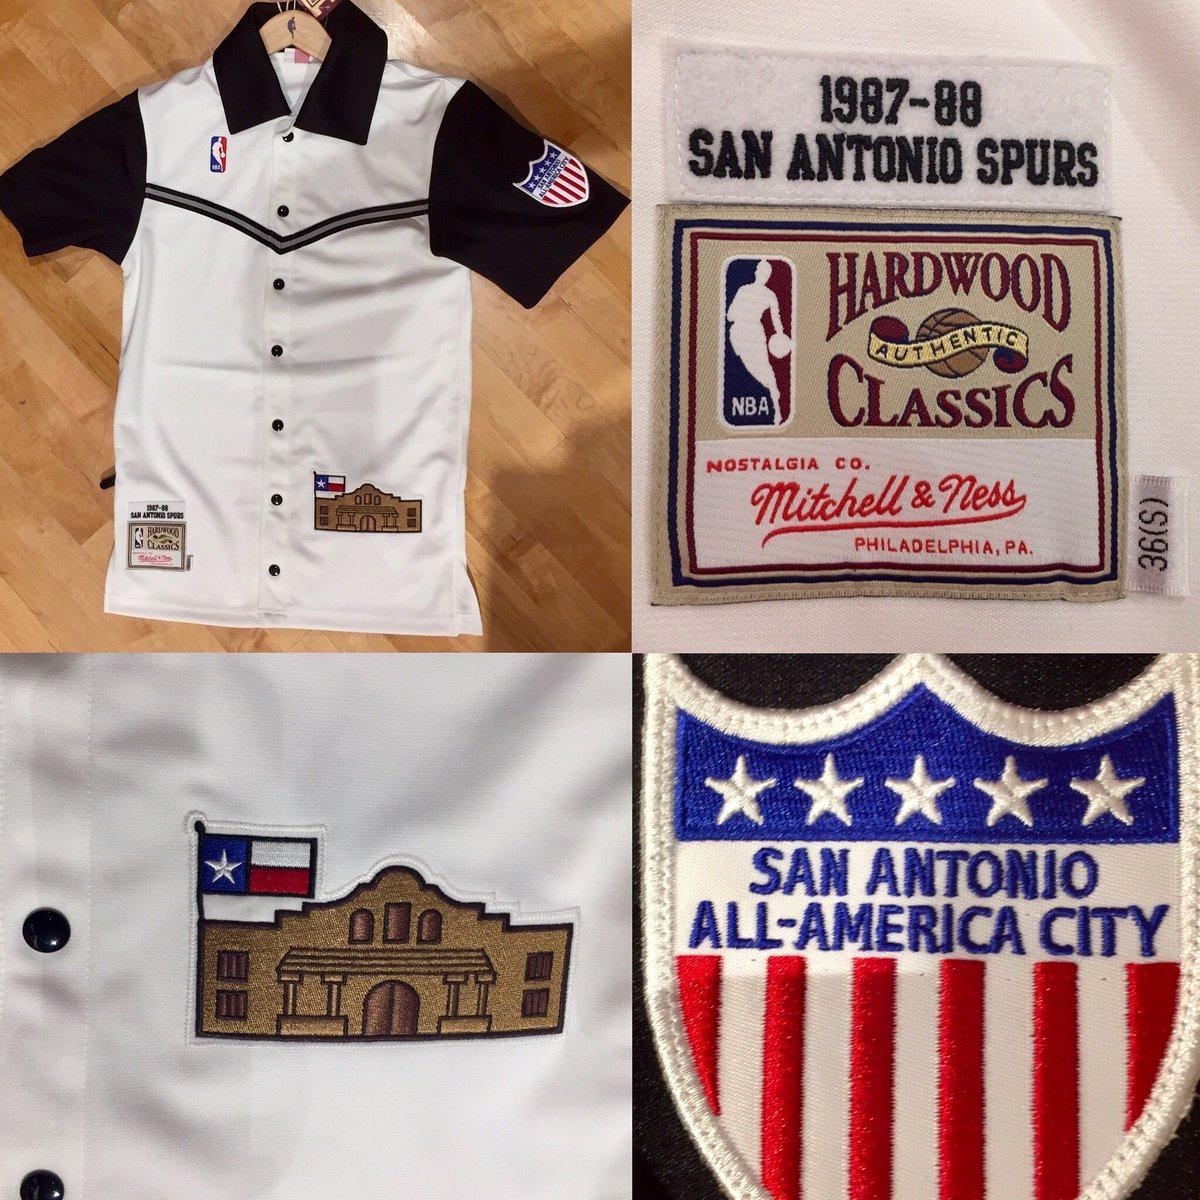 quality design 1d9b5 737b0 NBA Store on Twitter: